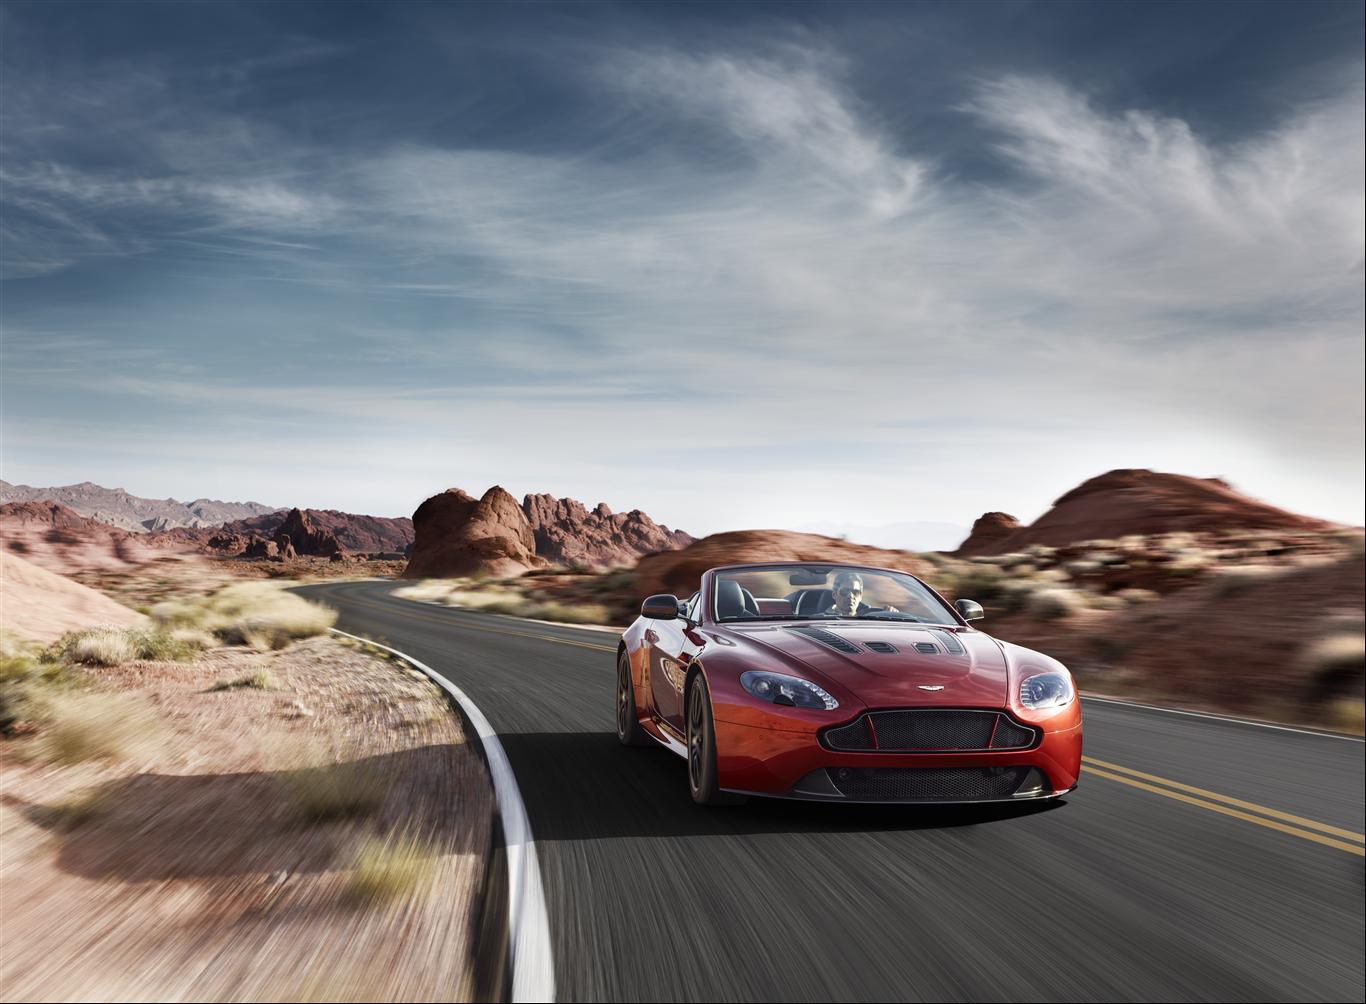 Aston Martin V12 Vantage S Roadster 2015 - 1